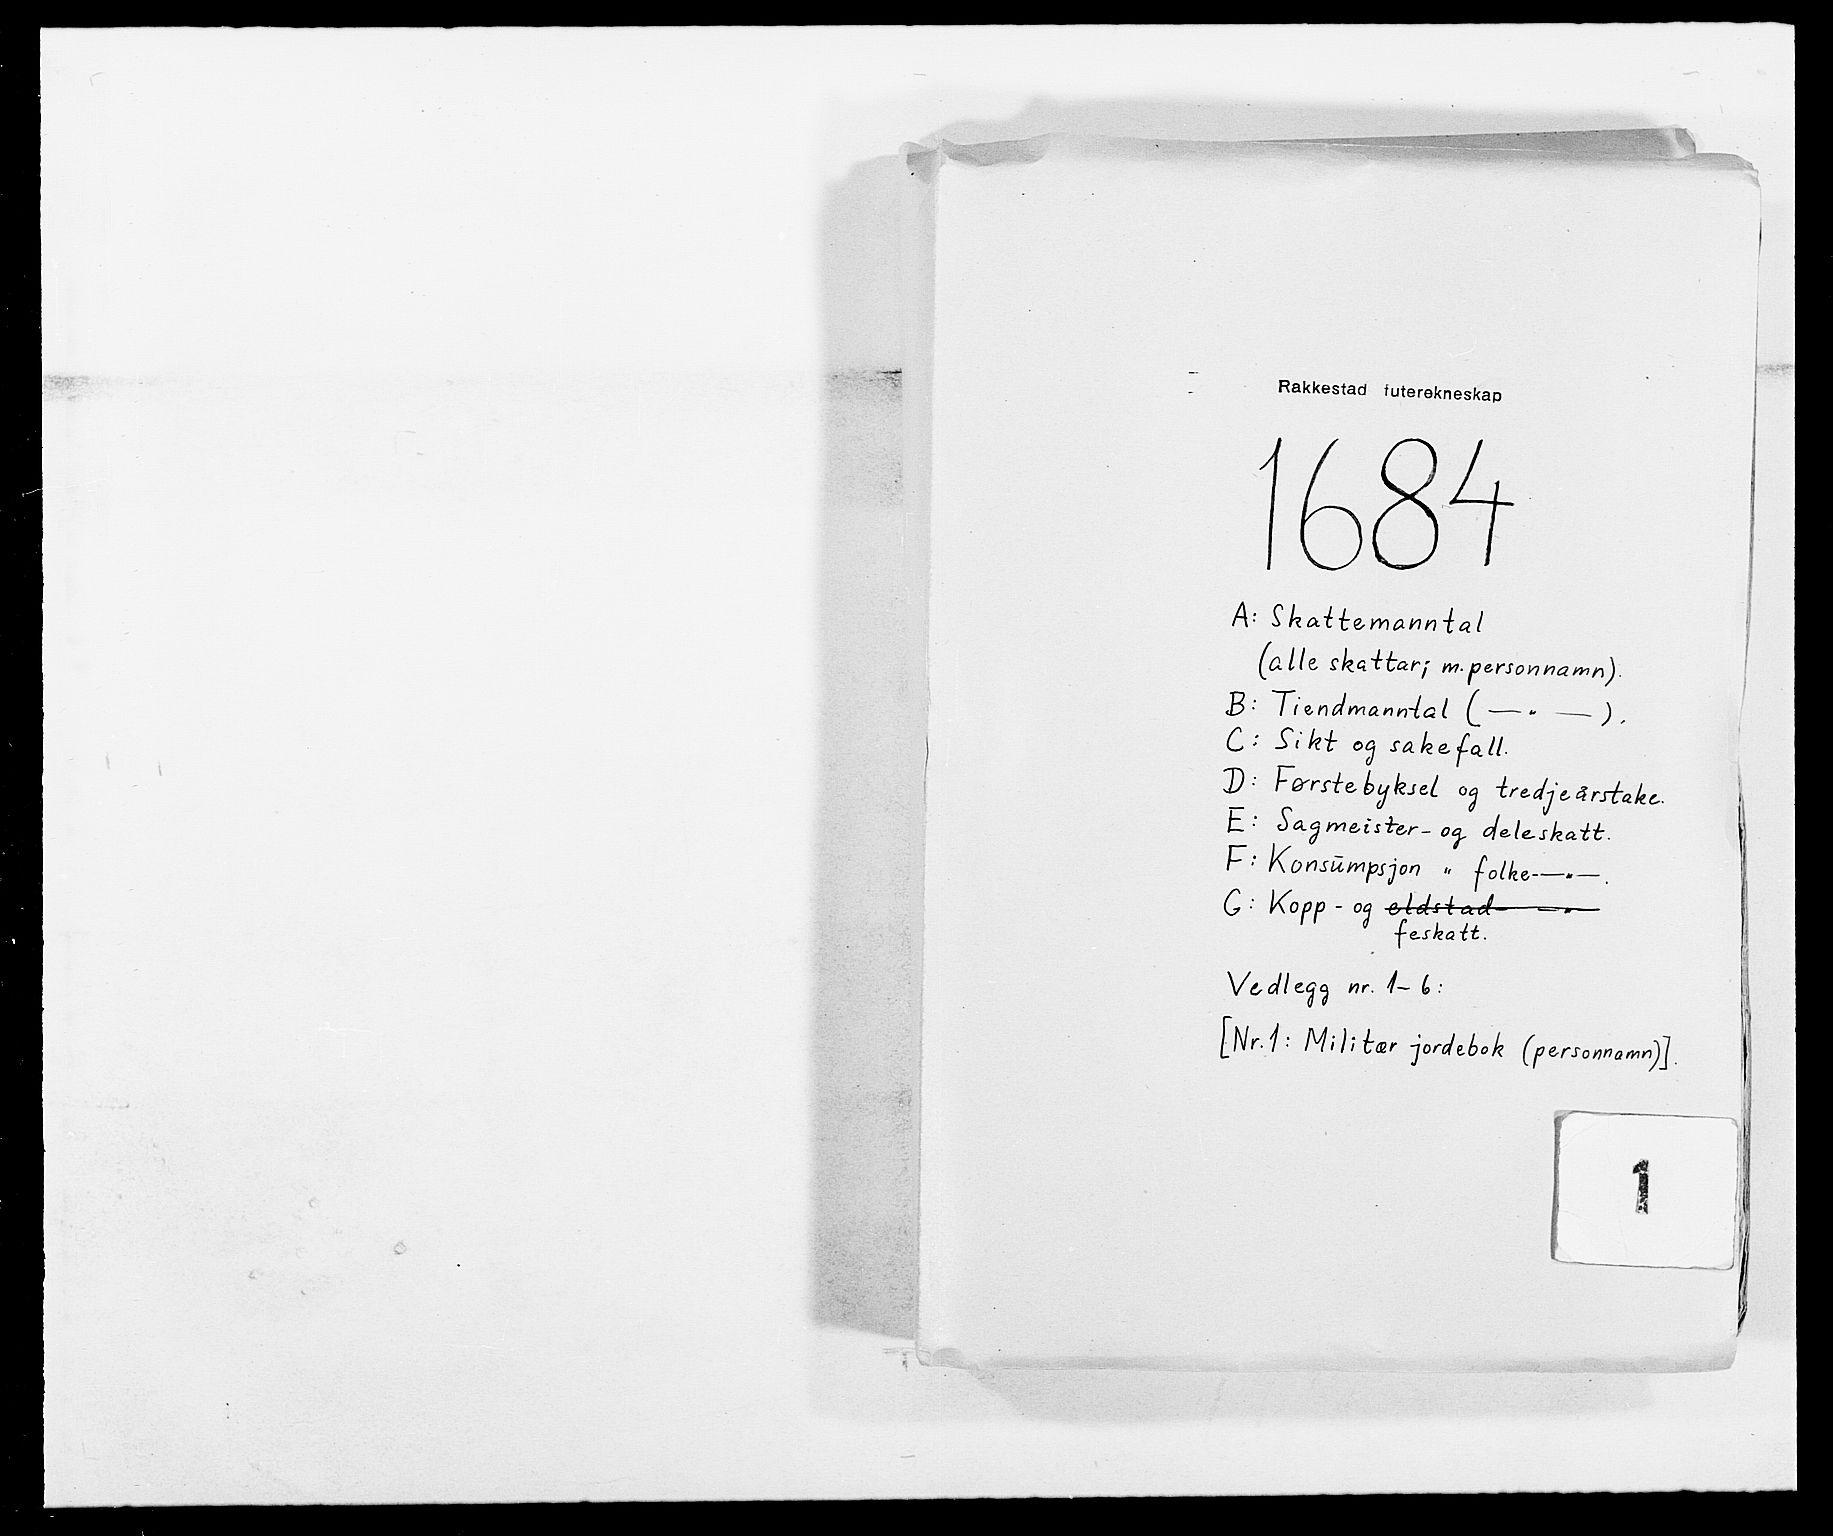 RA, Rentekammeret inntil 1814, Reviderte regnskaper, Fogderegnskap, R05/L0274: Fogderegnskap Rakkestad, 1683-1684, s. 231